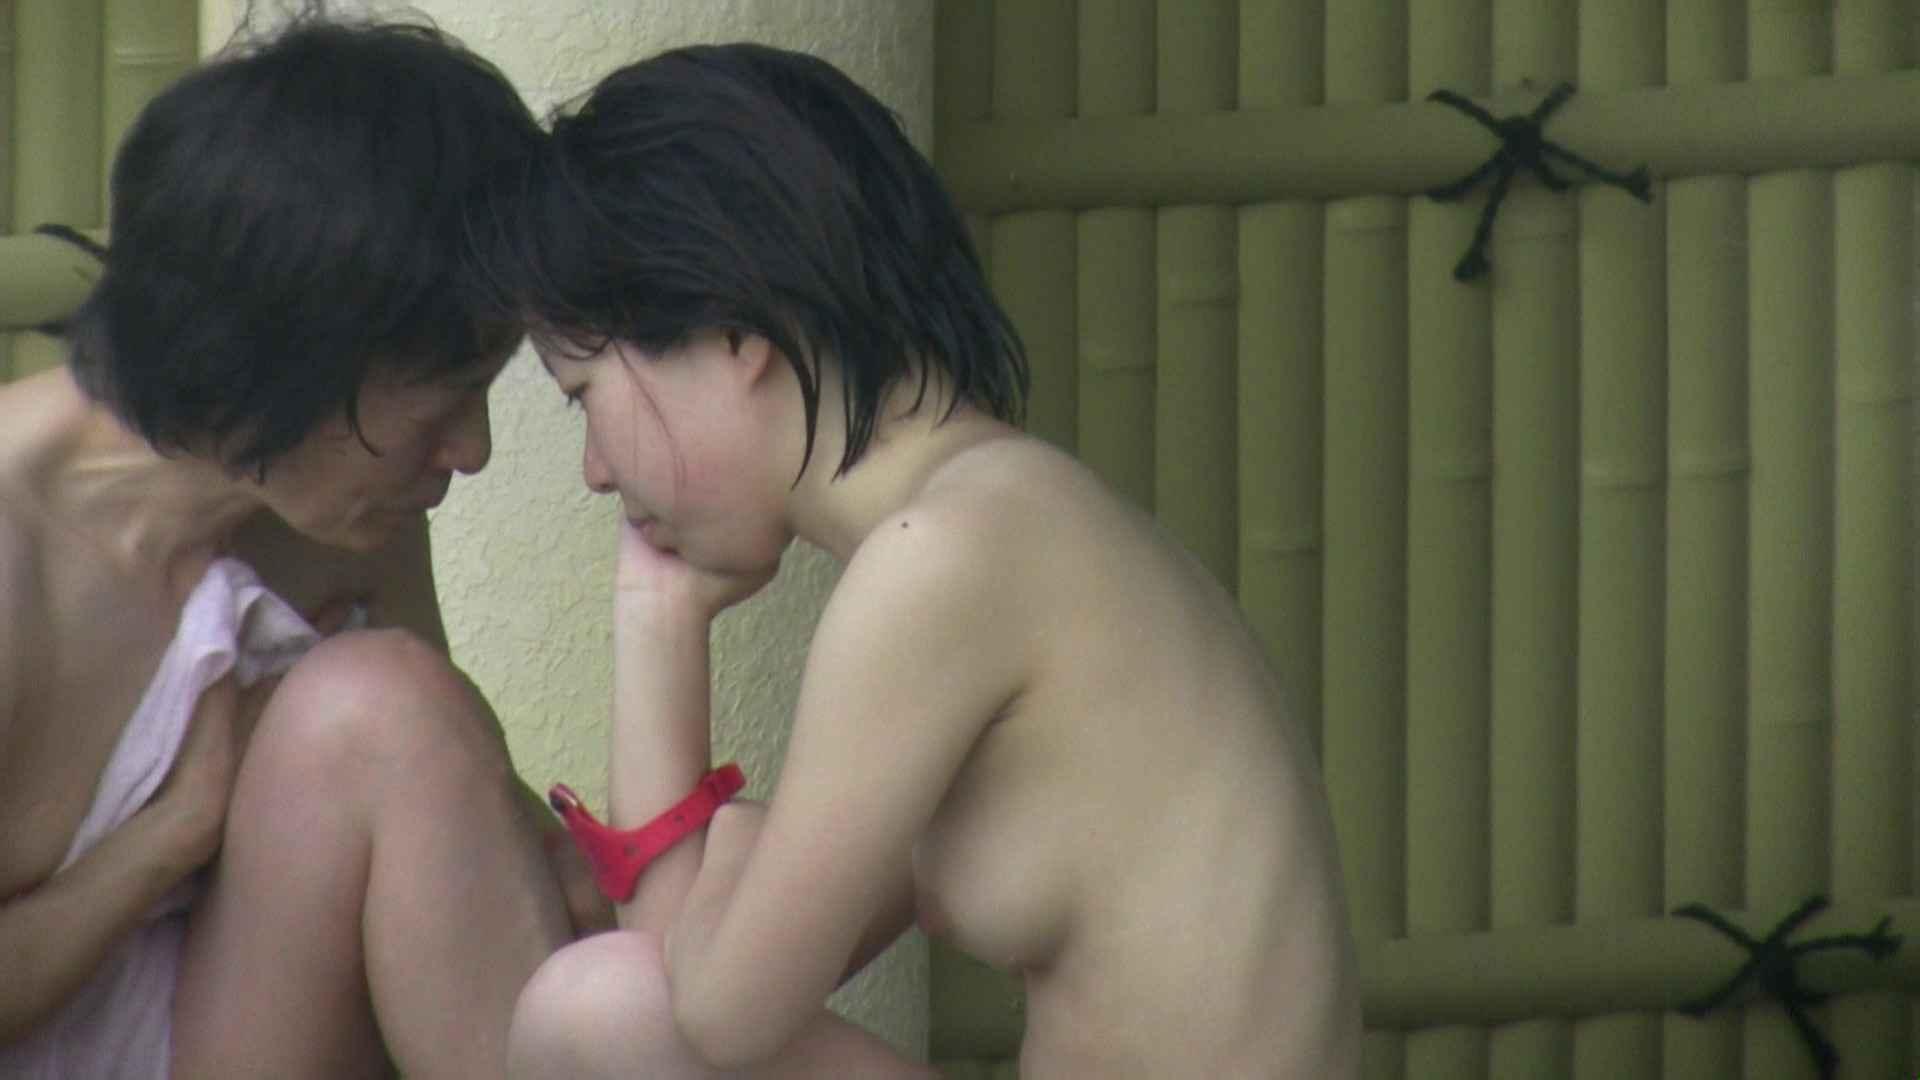 Aquaな露天風呂Vol.06【VIP】 露天 隠し撮りオマンコ動画紹介 87枚 14